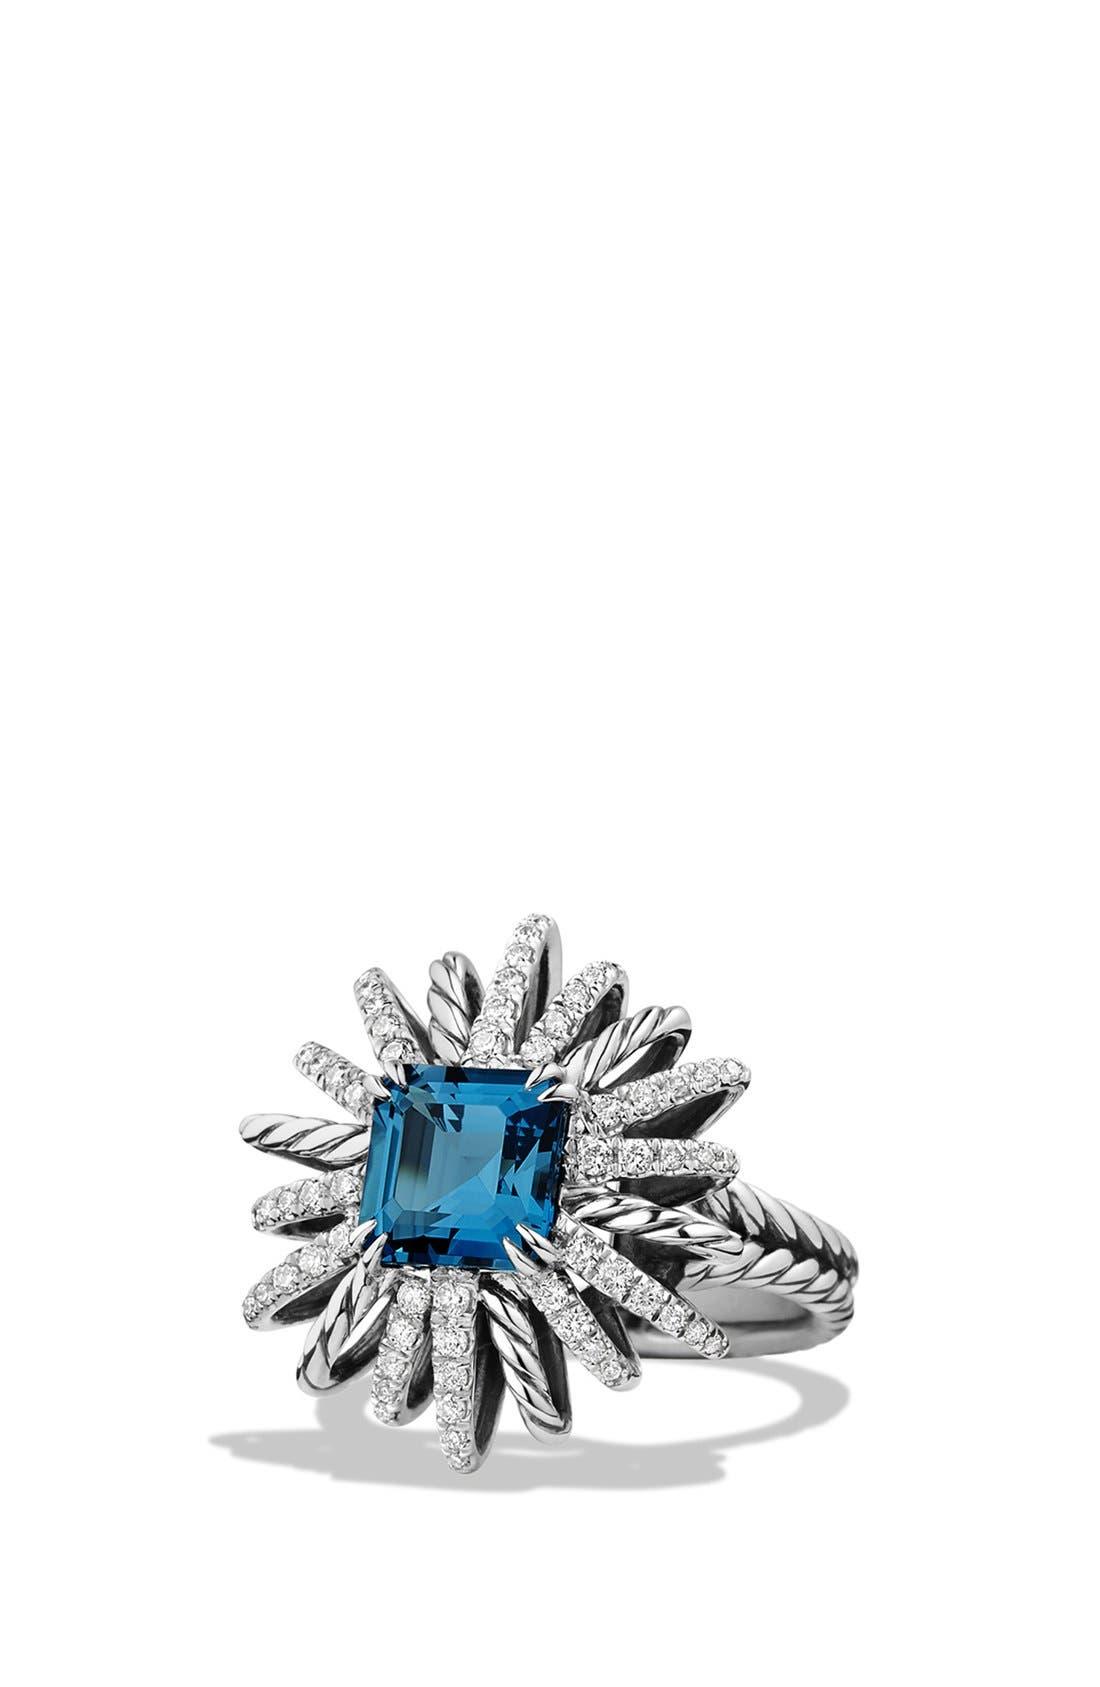 DAVID YURMAN 'Starburst' Ring with Diamonds in Silver, Main, color, 402